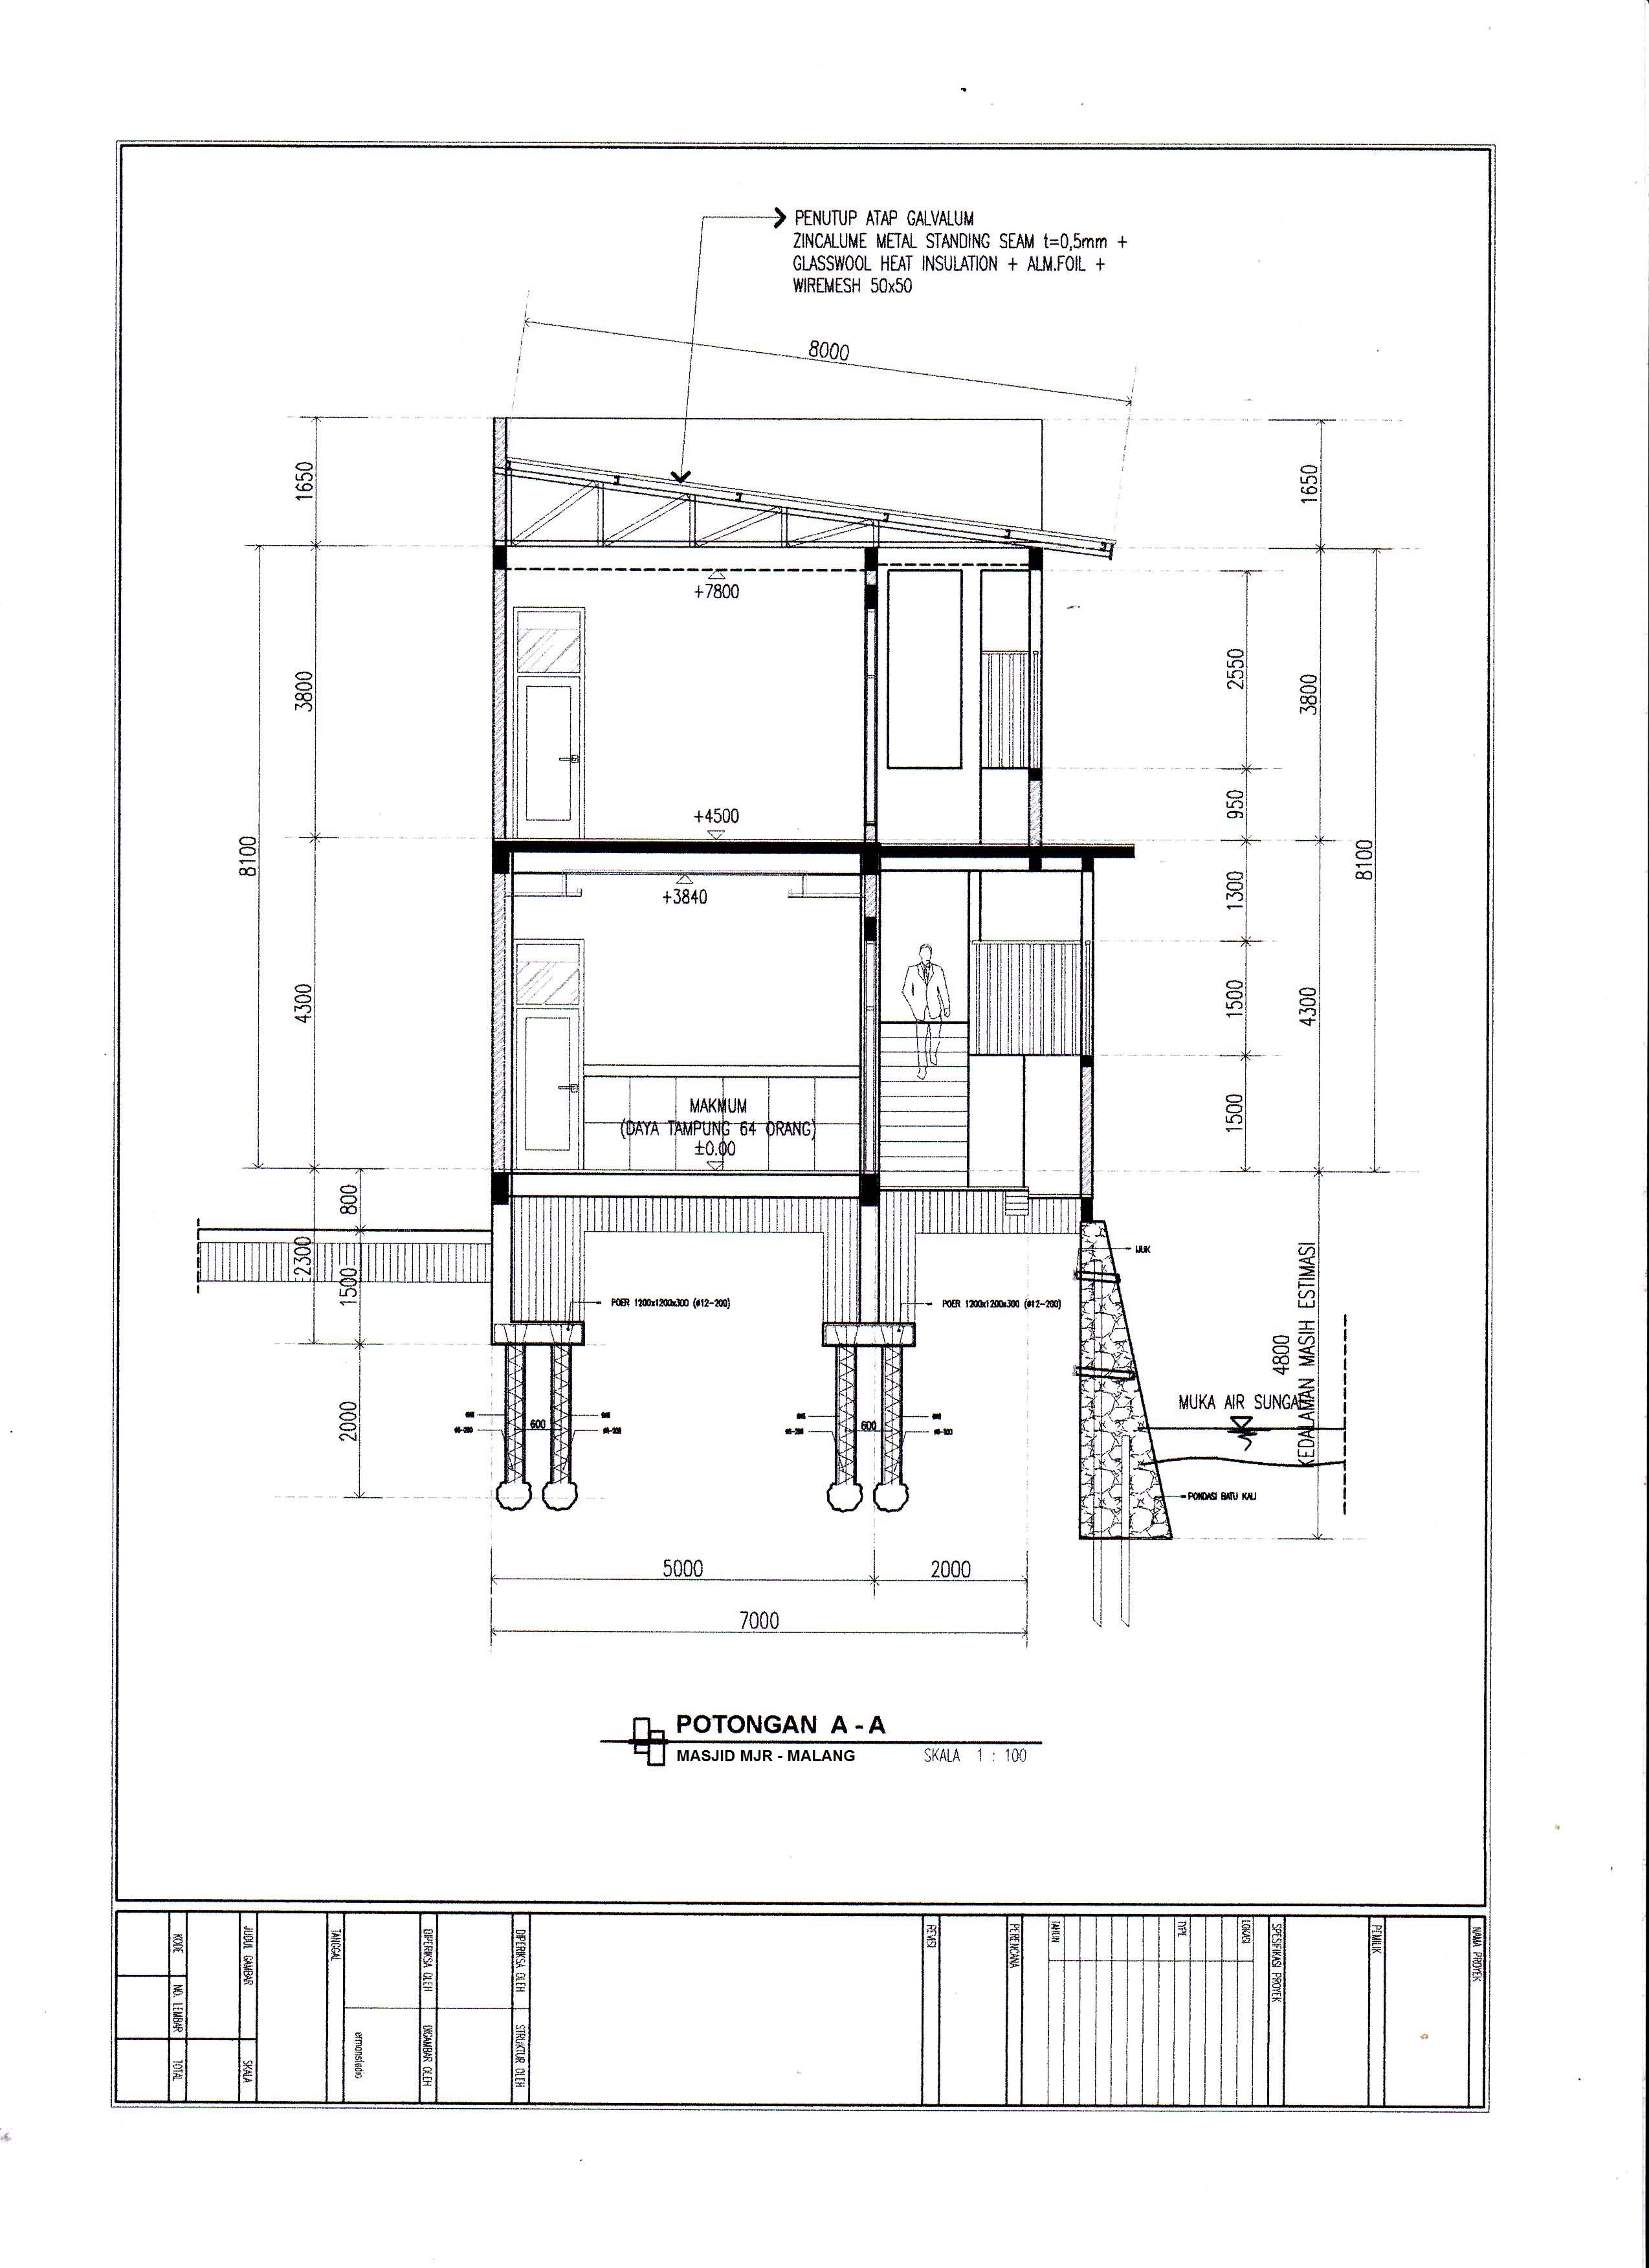 Rencana Anggaran Biaya Pembangunan Masjid Rencana Anggaran Biaya